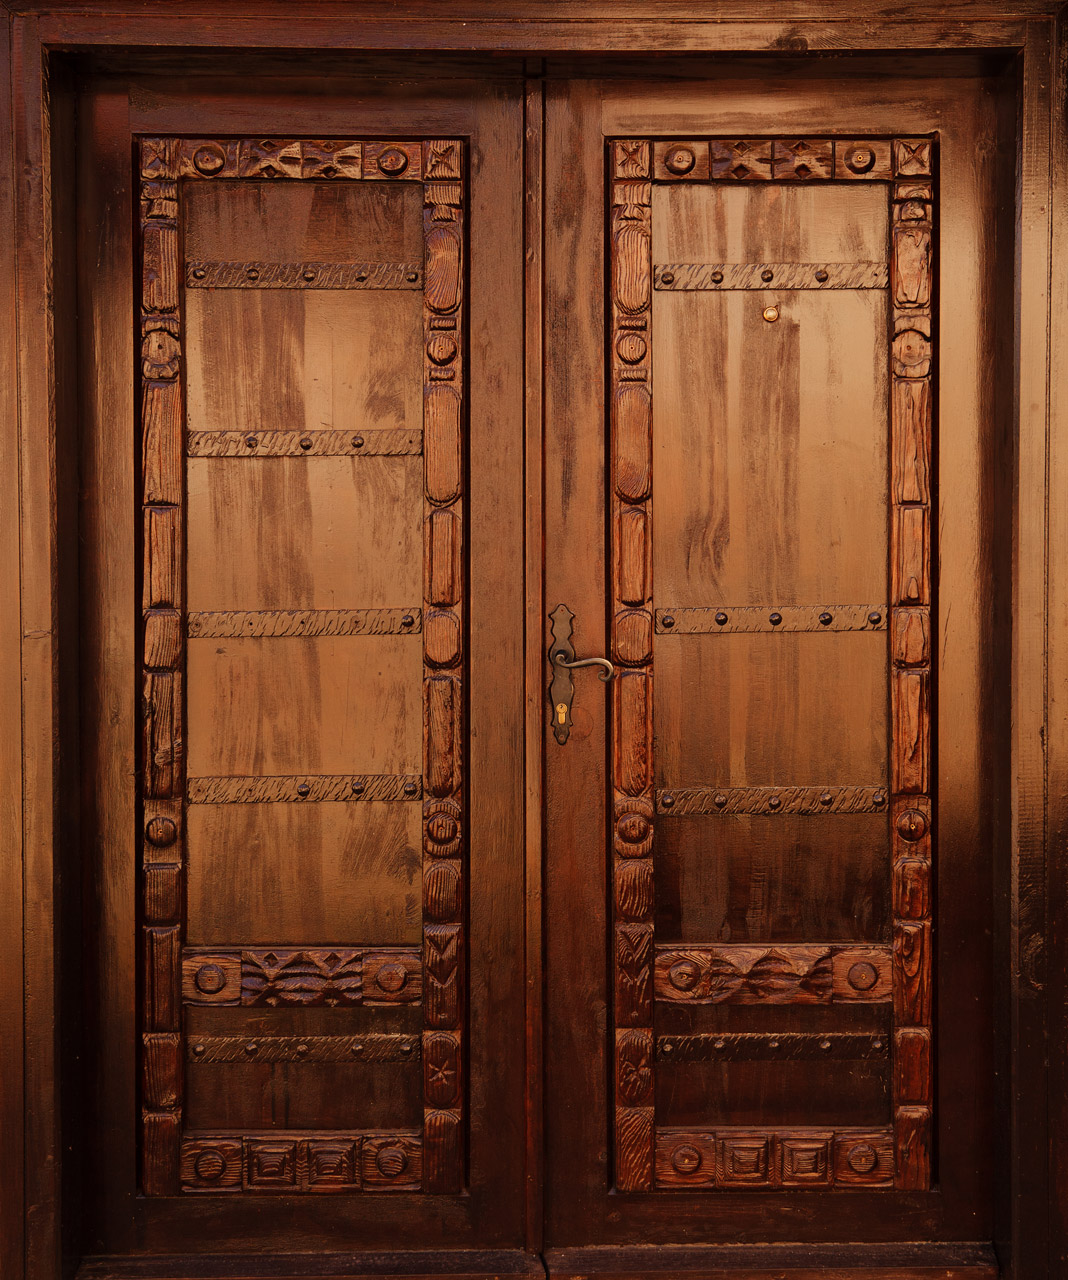 door depositphotos wooden lehakok old photo stock